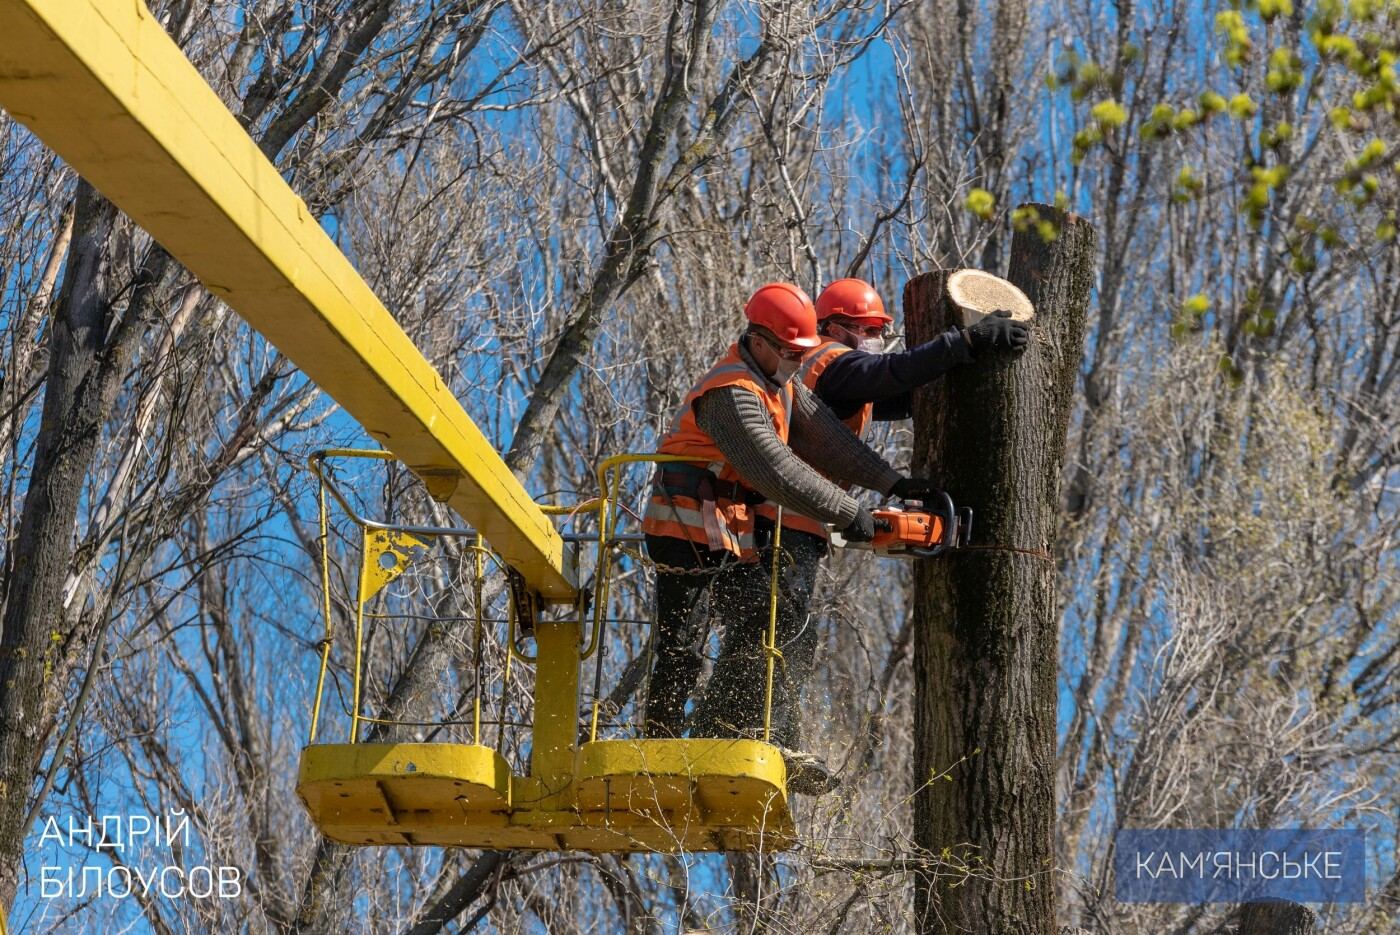 Каменчанам Соцгорода и БАМа модернизируют электрические сети, фото-5